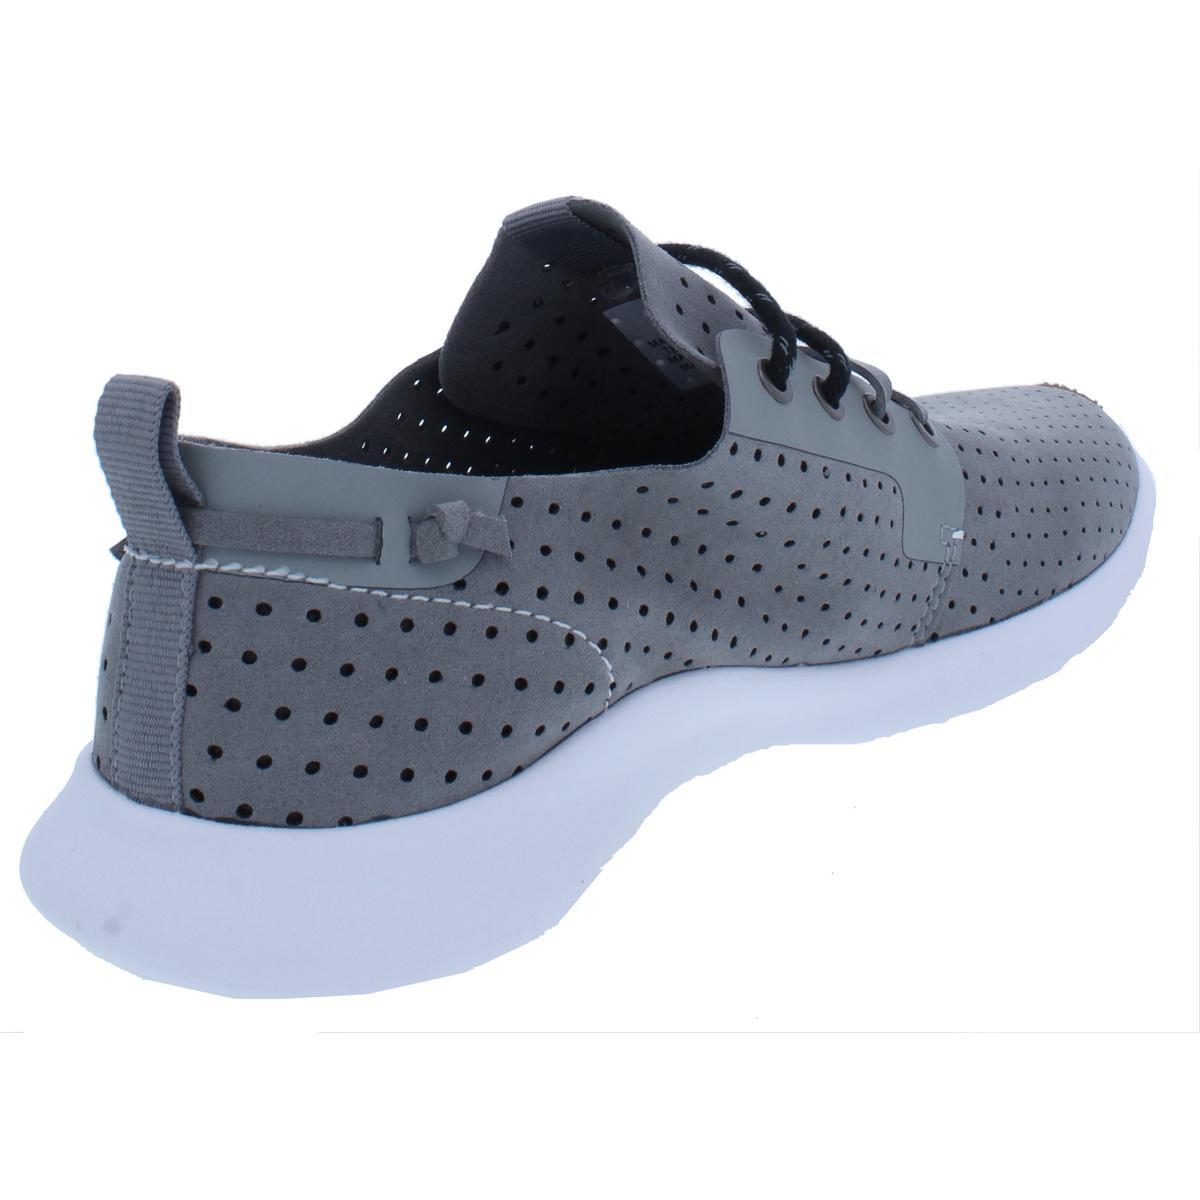 Steve-Madden-Men-039-s-Brick-Faux-Suede-Athletic-Fashion-Sneaker-Trainers-Shoes thumbnail 6